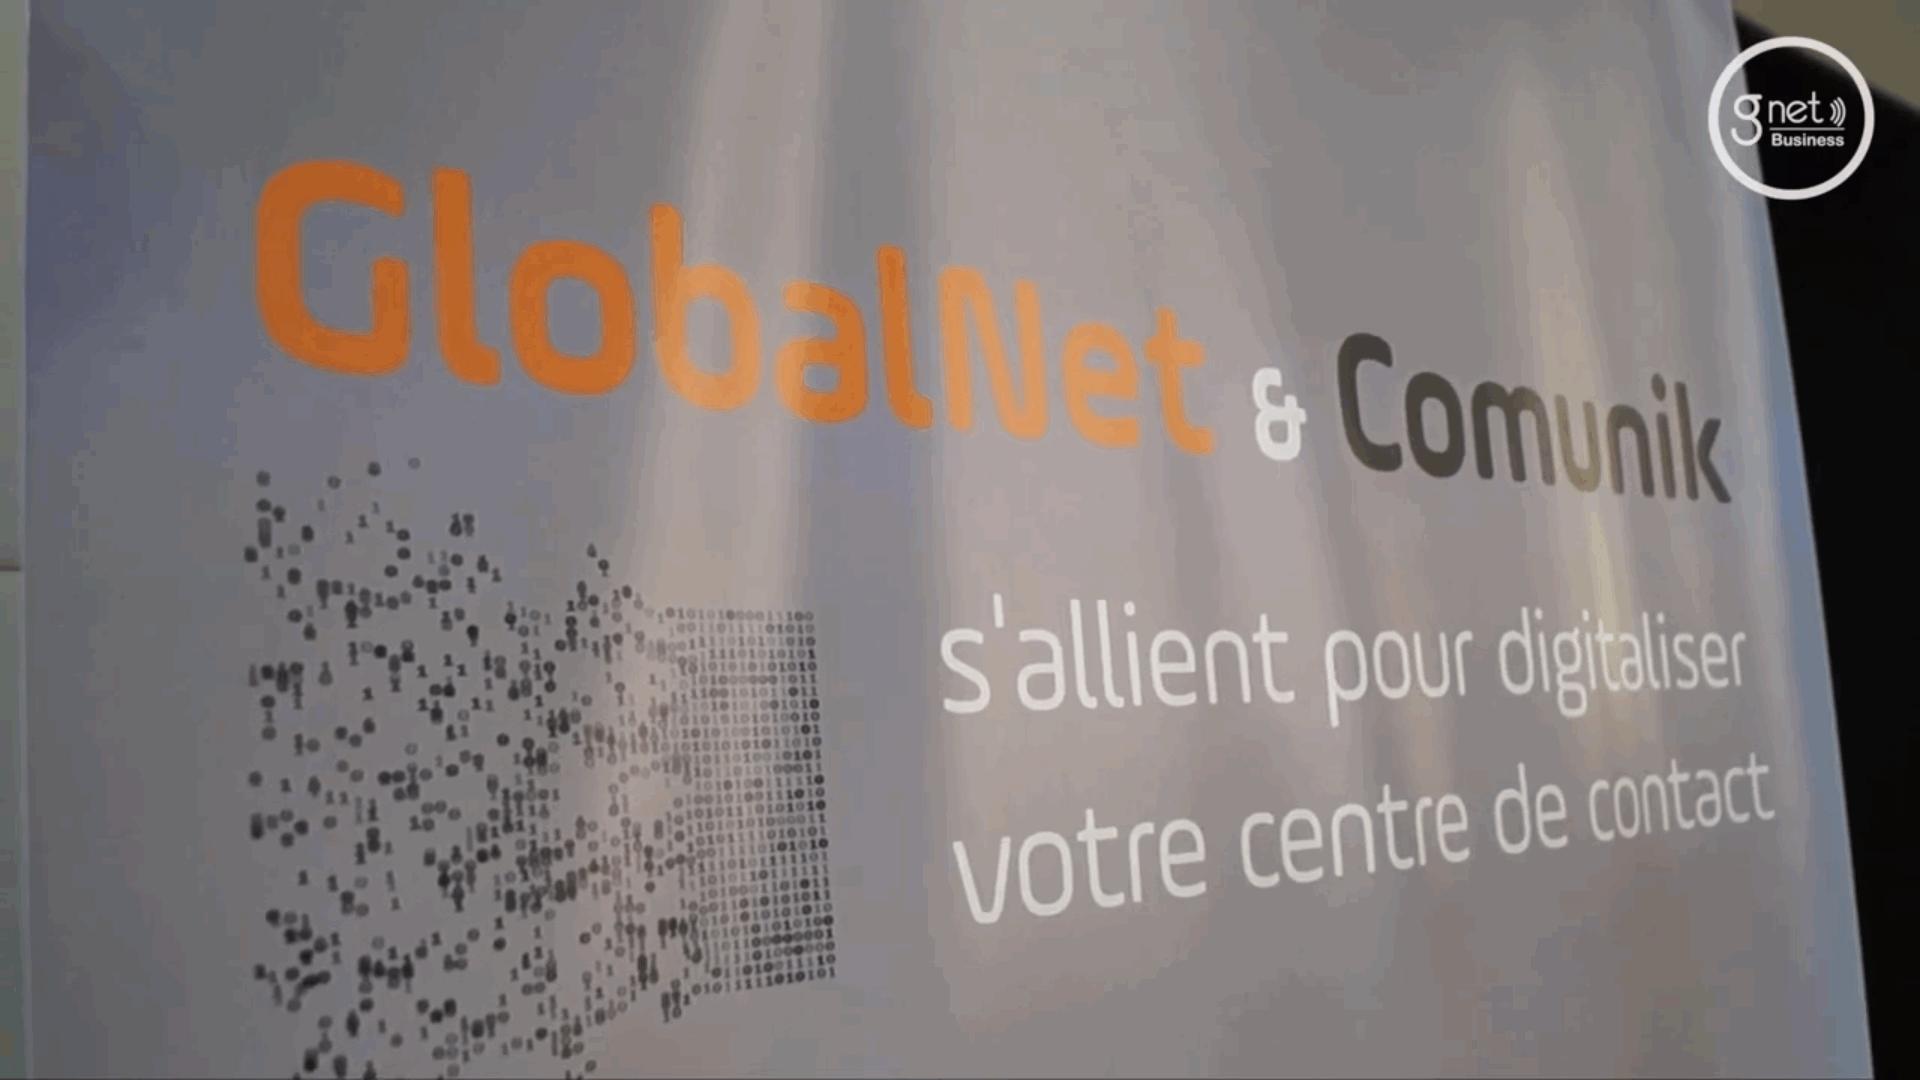 Signature du Partenariat GlobalNet & Comunik